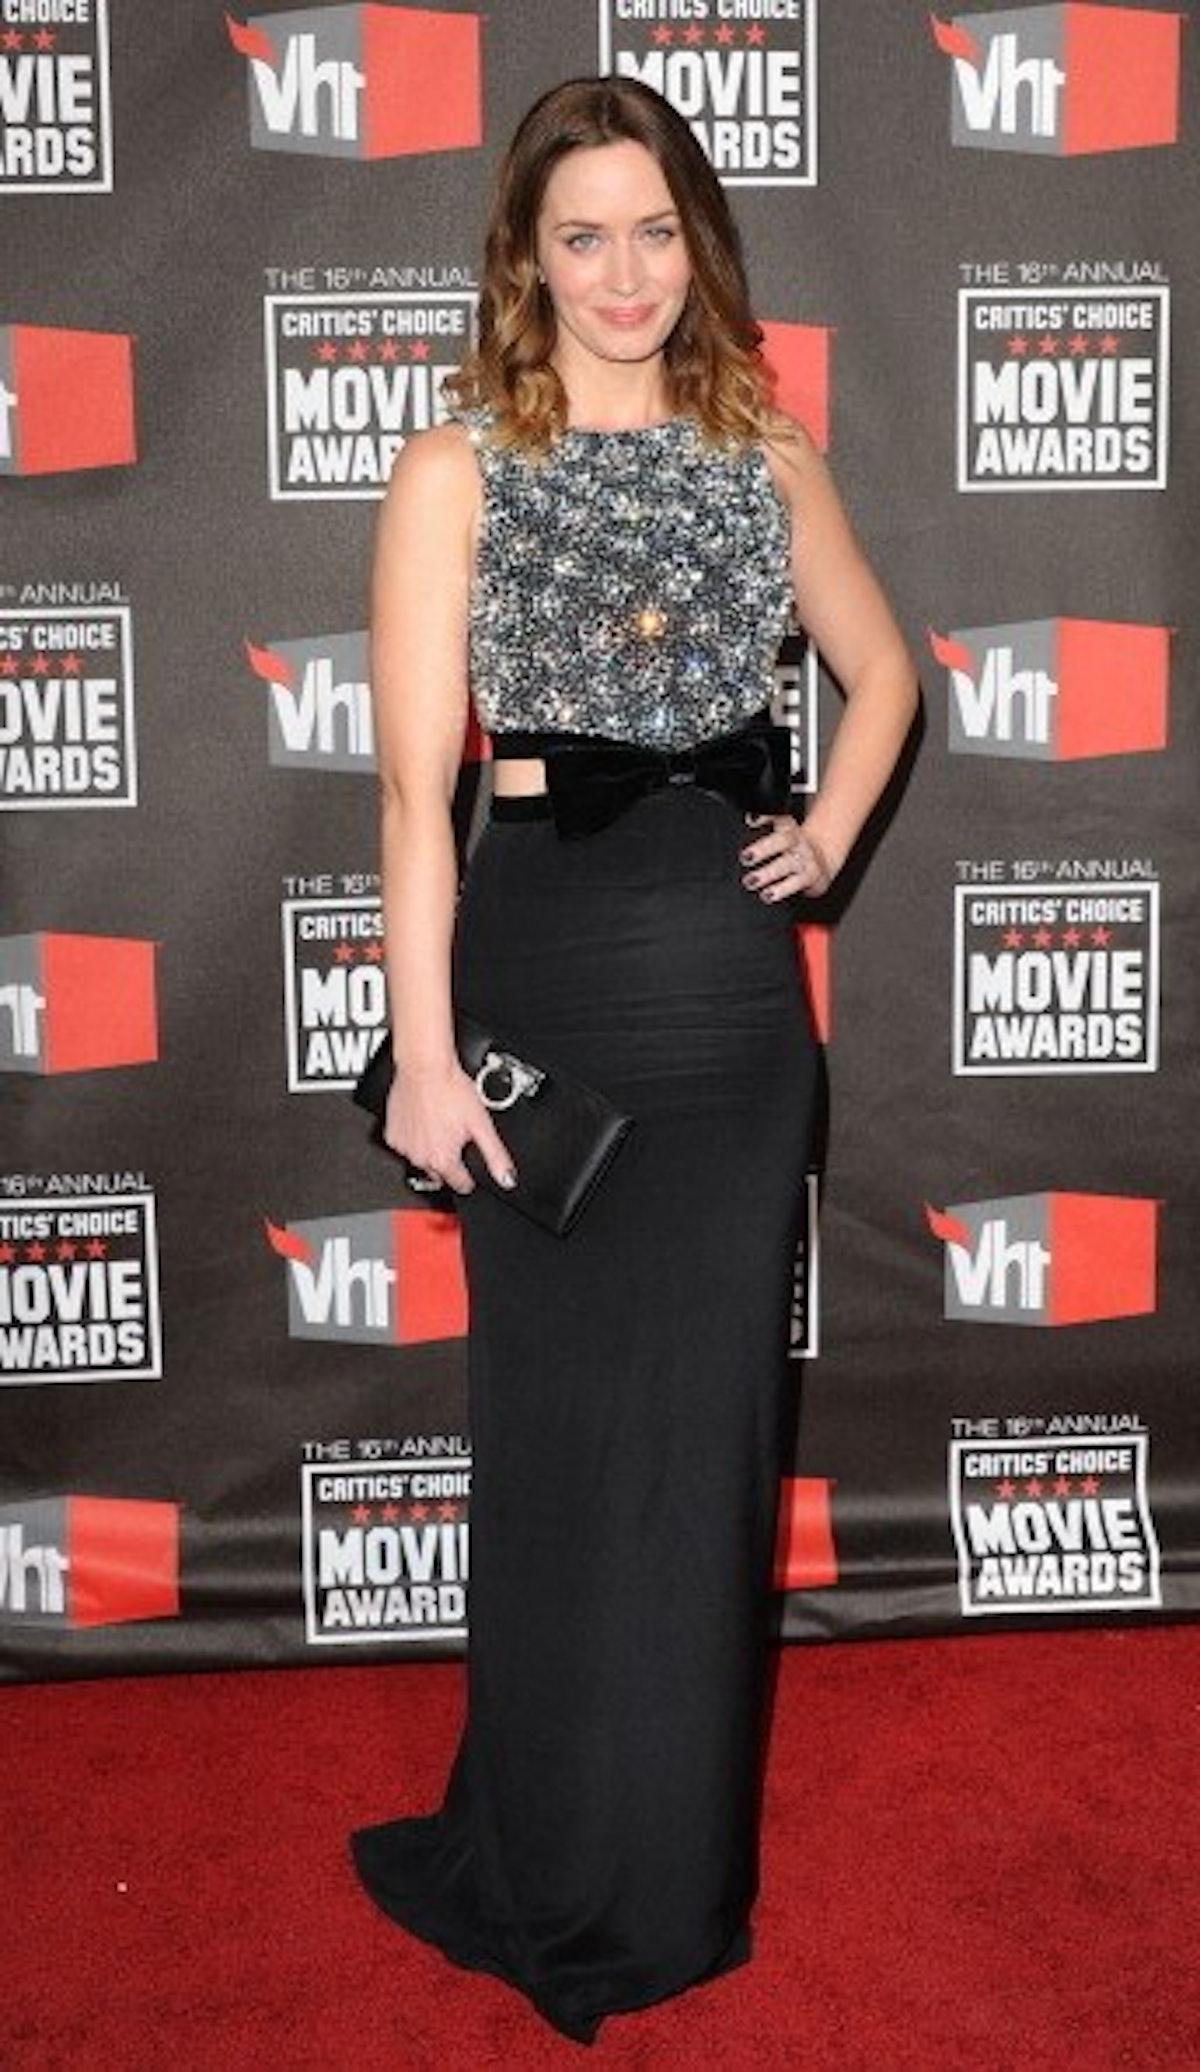 Emily Blunt in a beaded metallic top of sorts.